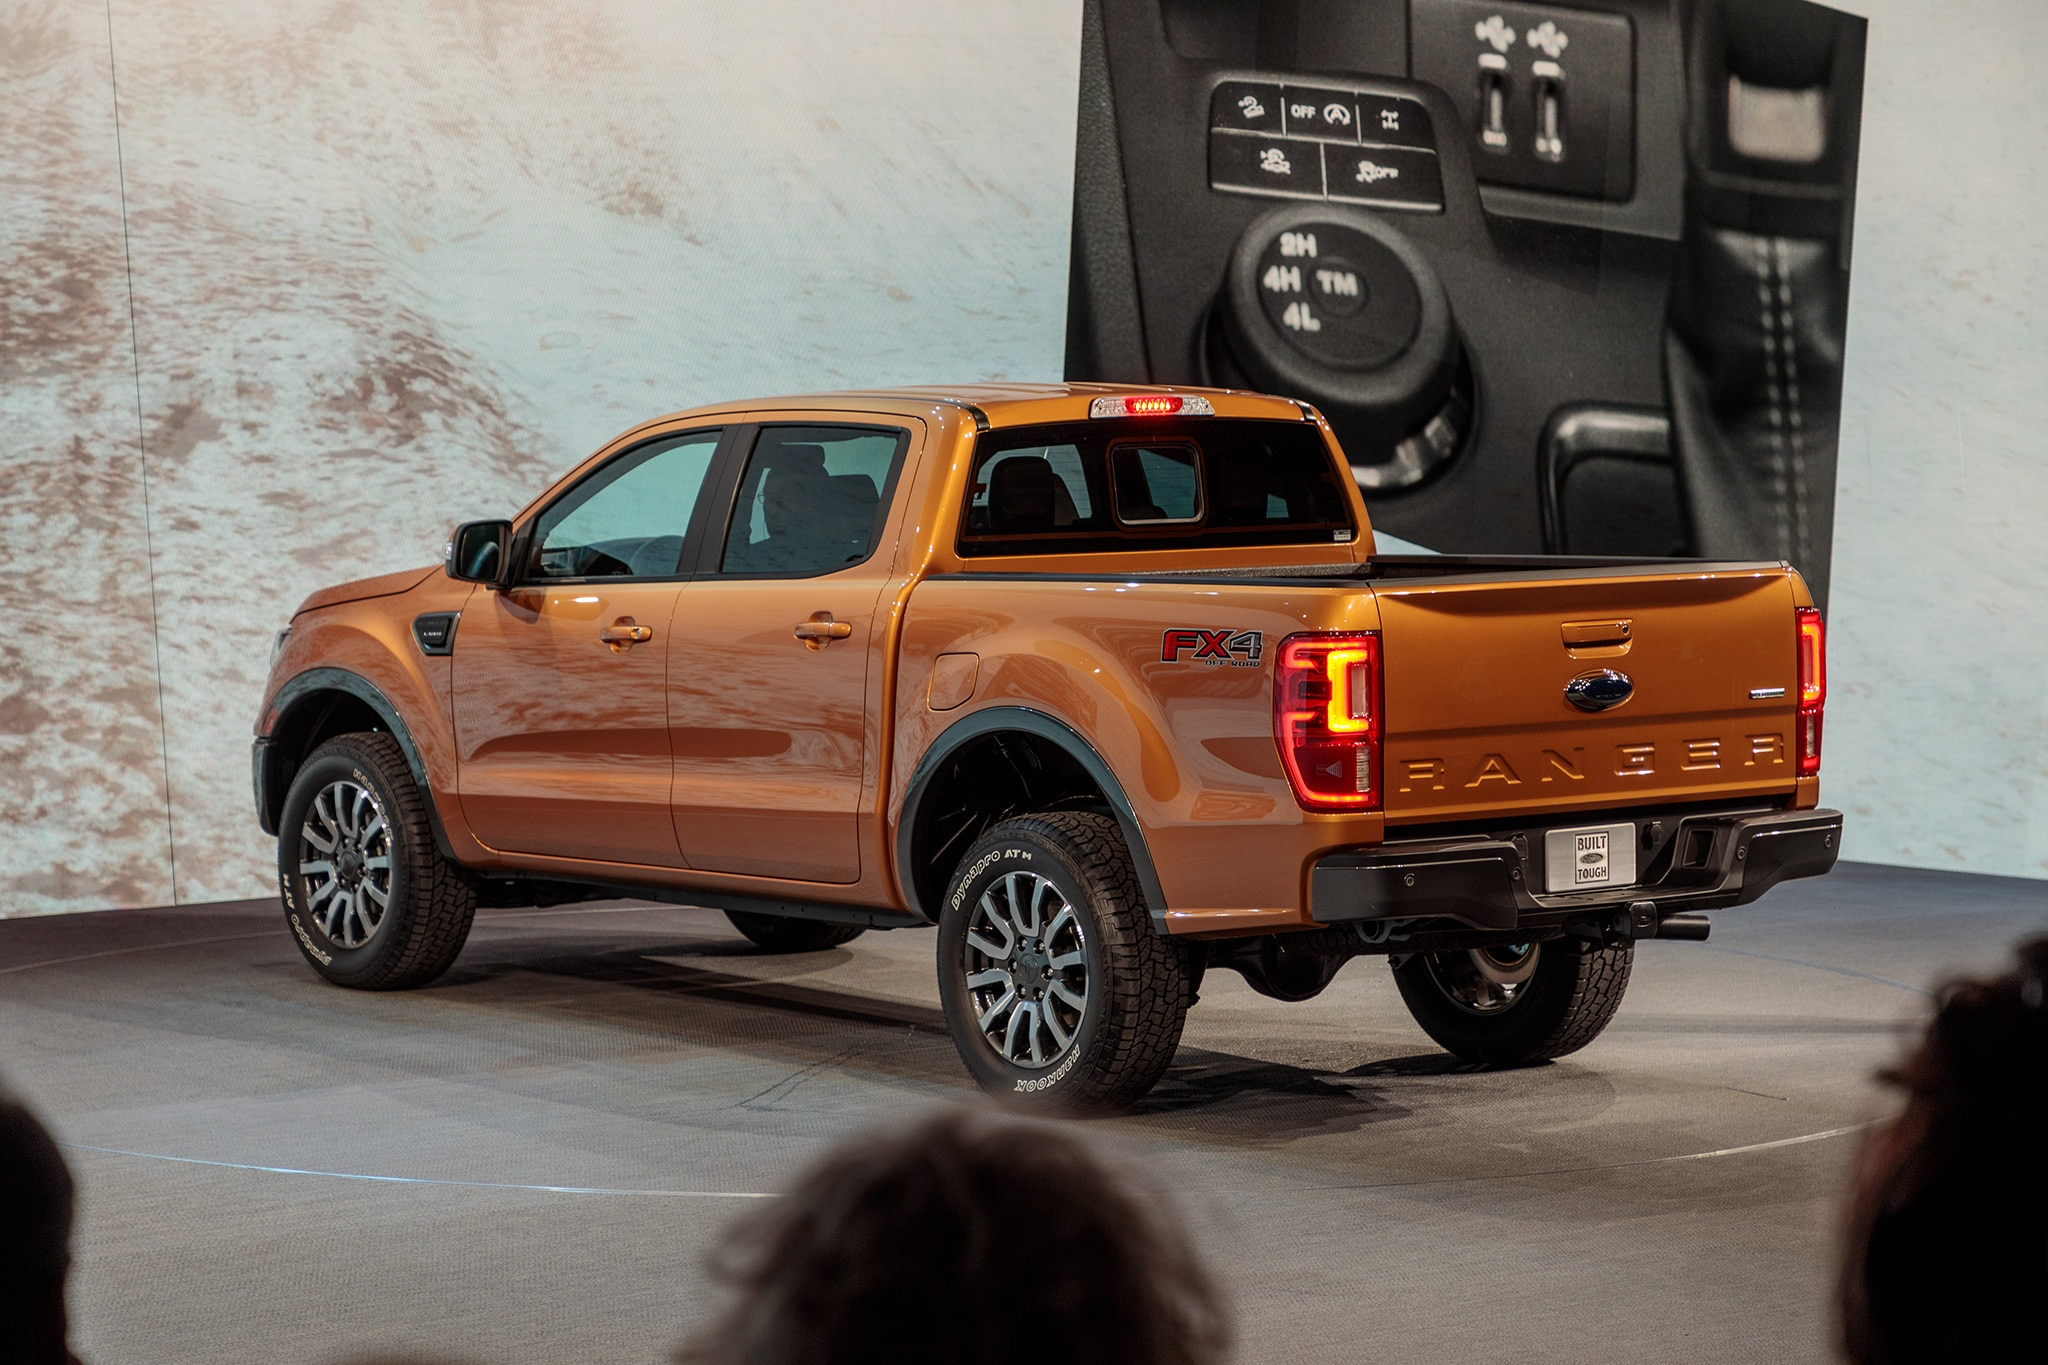 2019 Ford Ranger Packs 310 Pound-Feet of Torque | Automobile Magazine